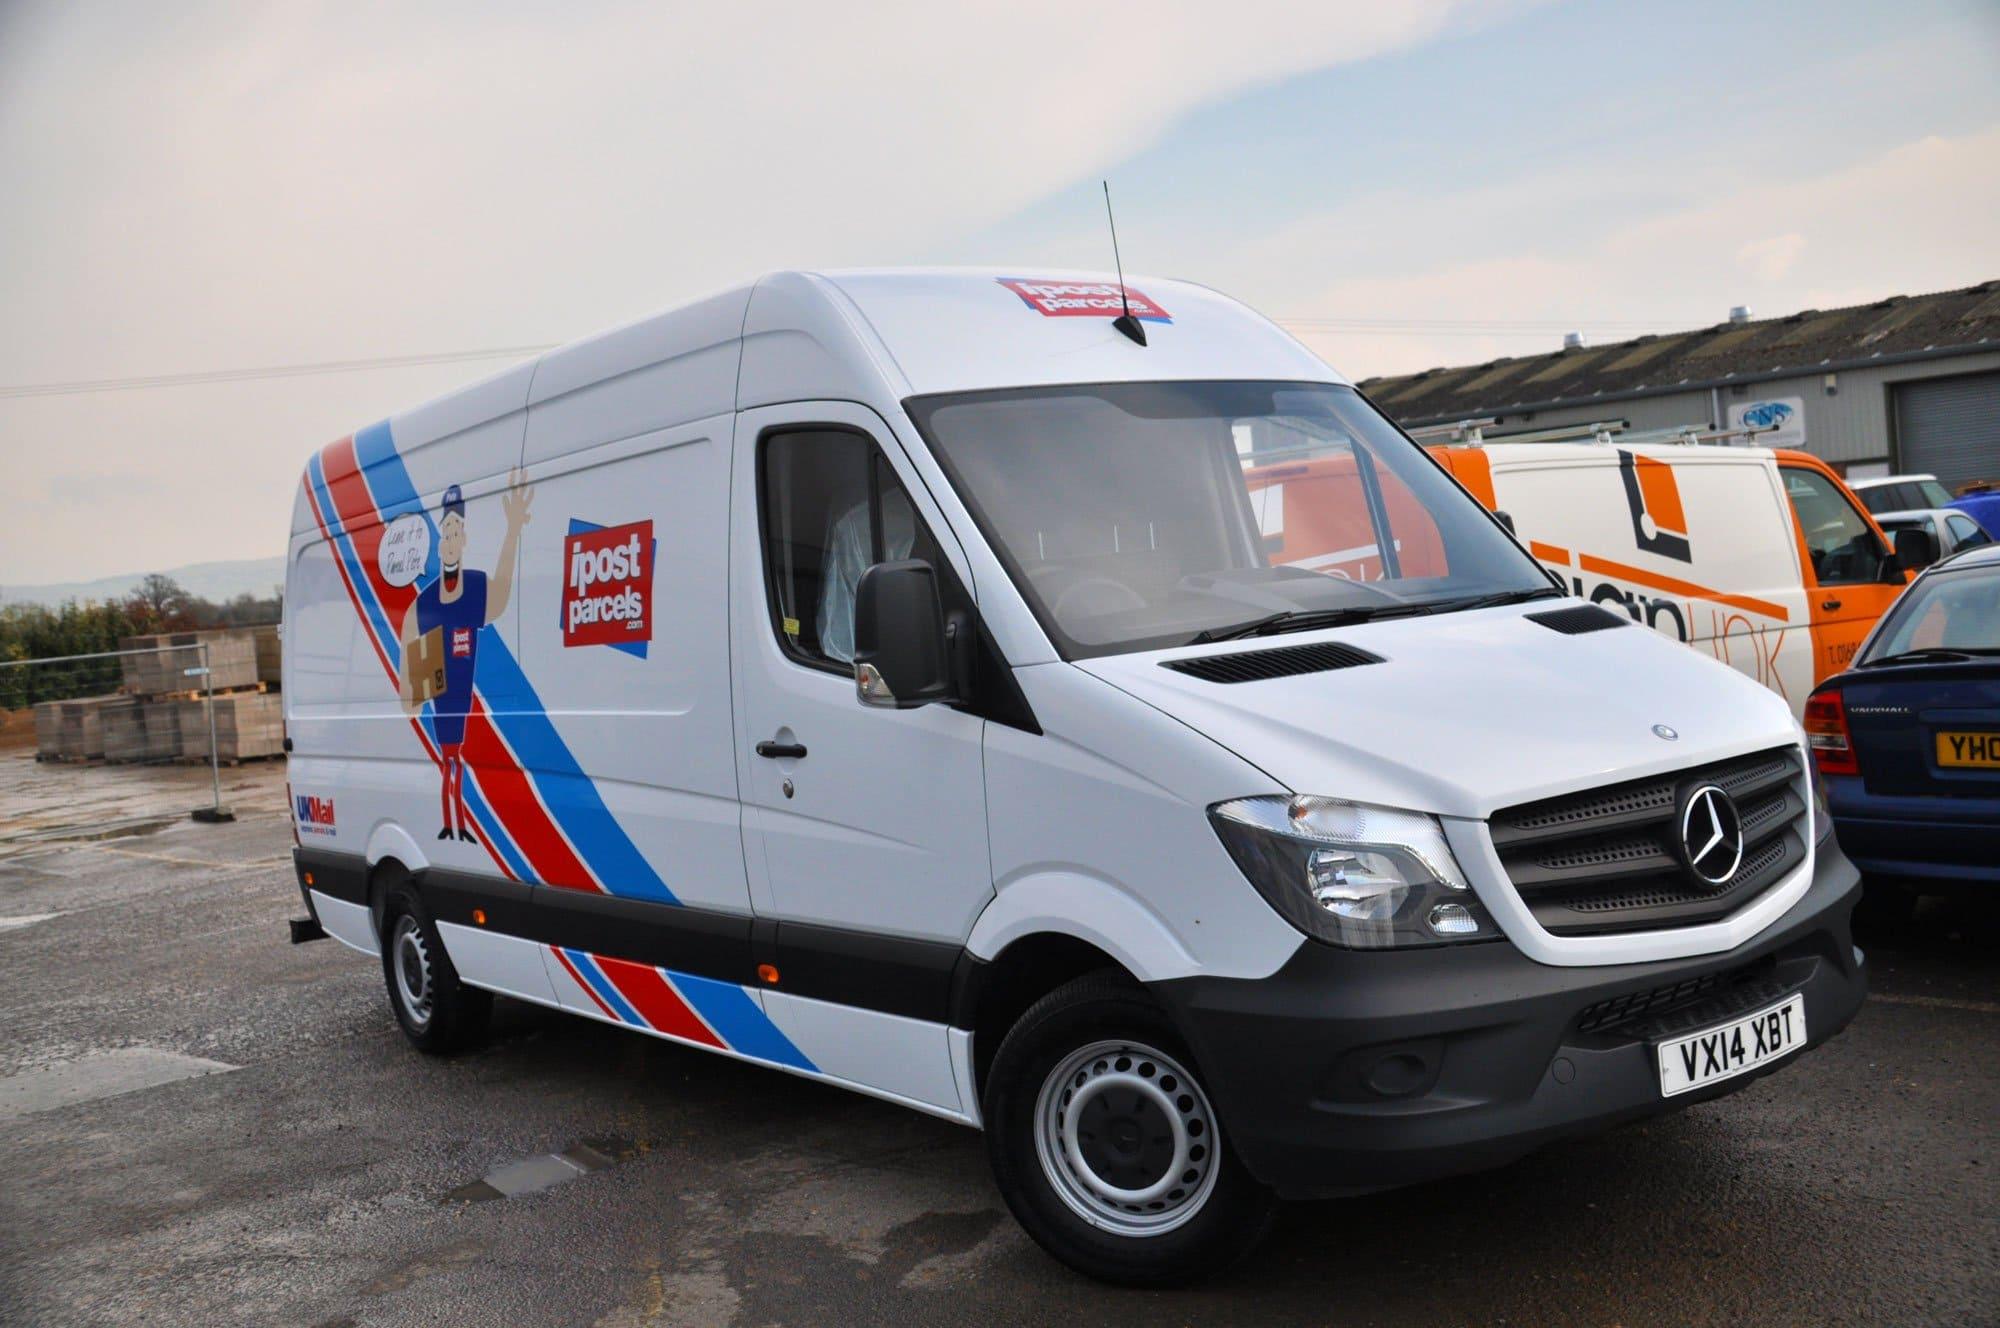 Vinyl vehicle graphics for a mercedes van